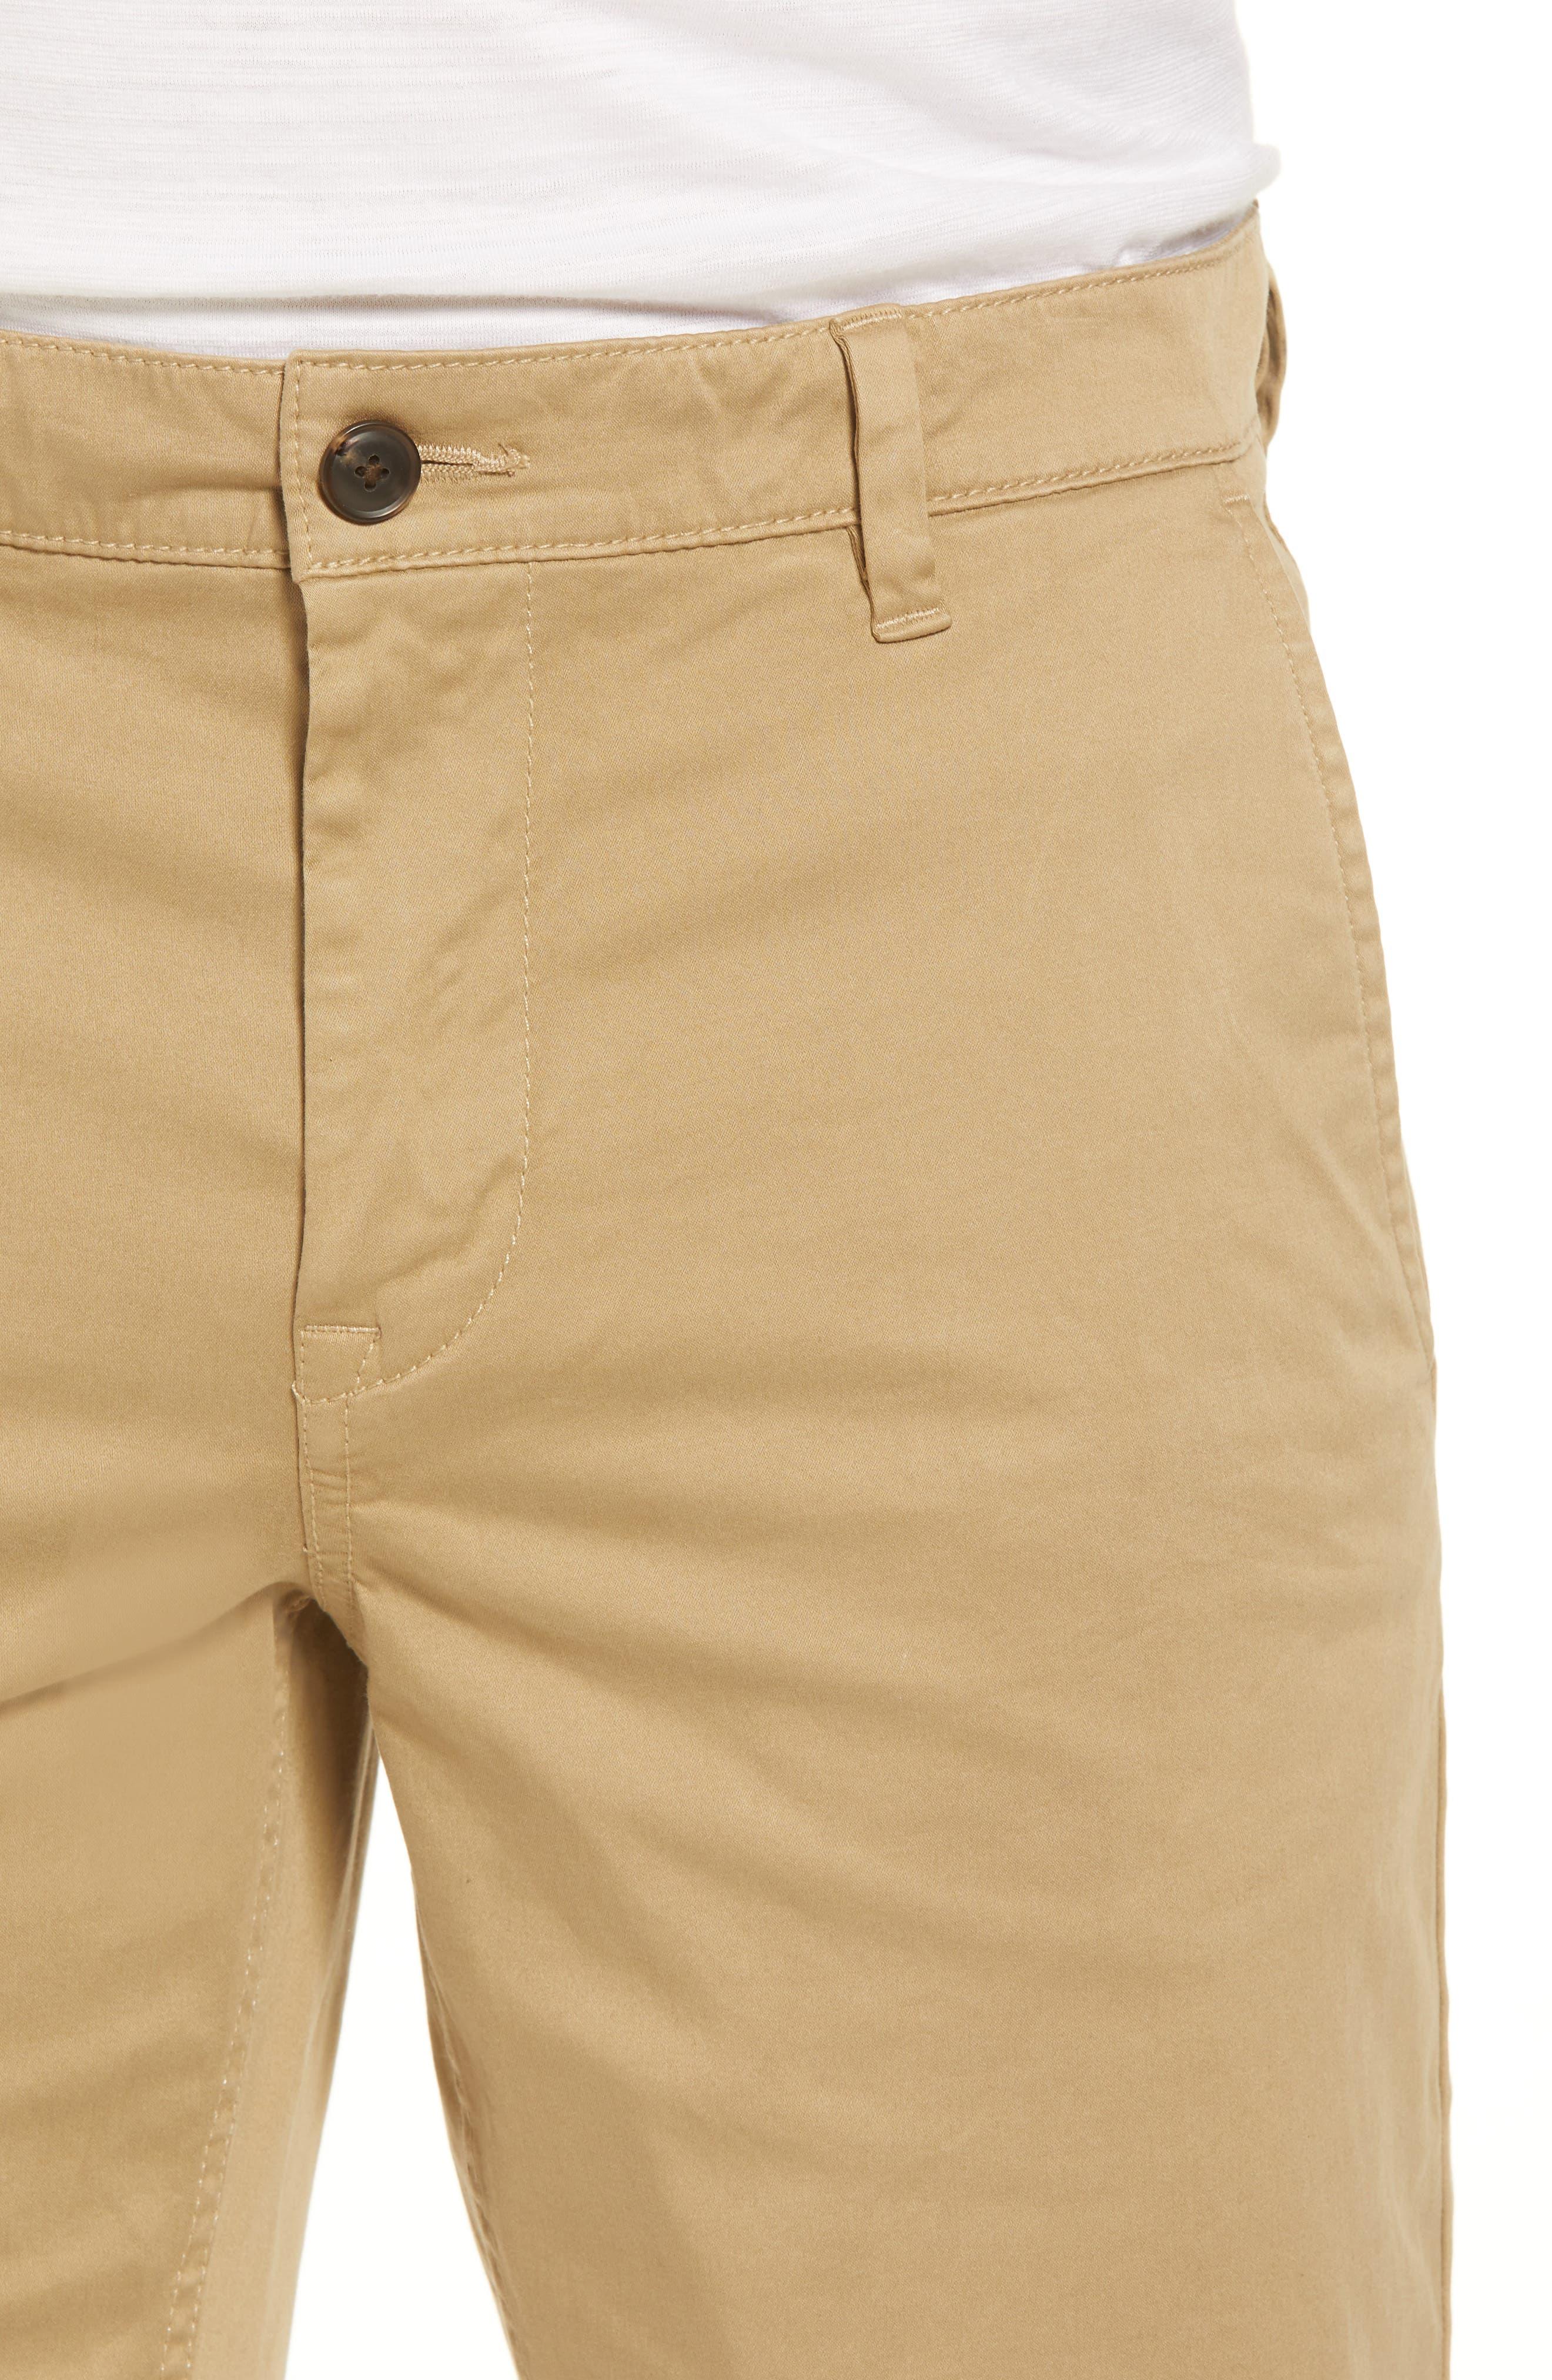 Slim Fit Shorts,                             Alternate thumbnail 4, color,                             200